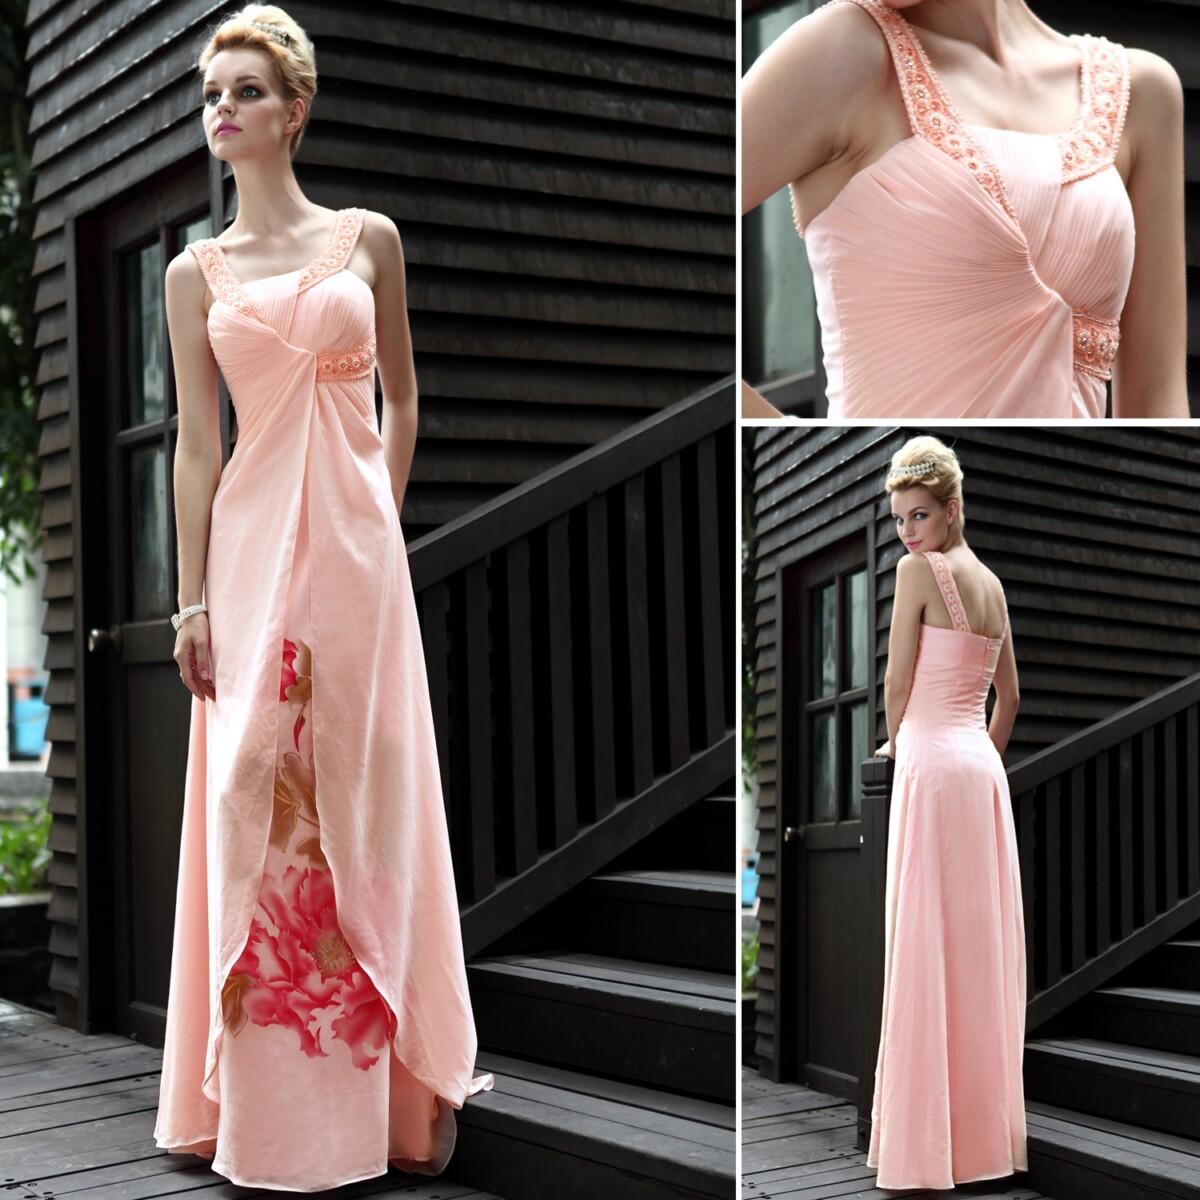 Performance star formal dress pink print evening dress t formal dress bride evening dress 30558(China (Mainland))